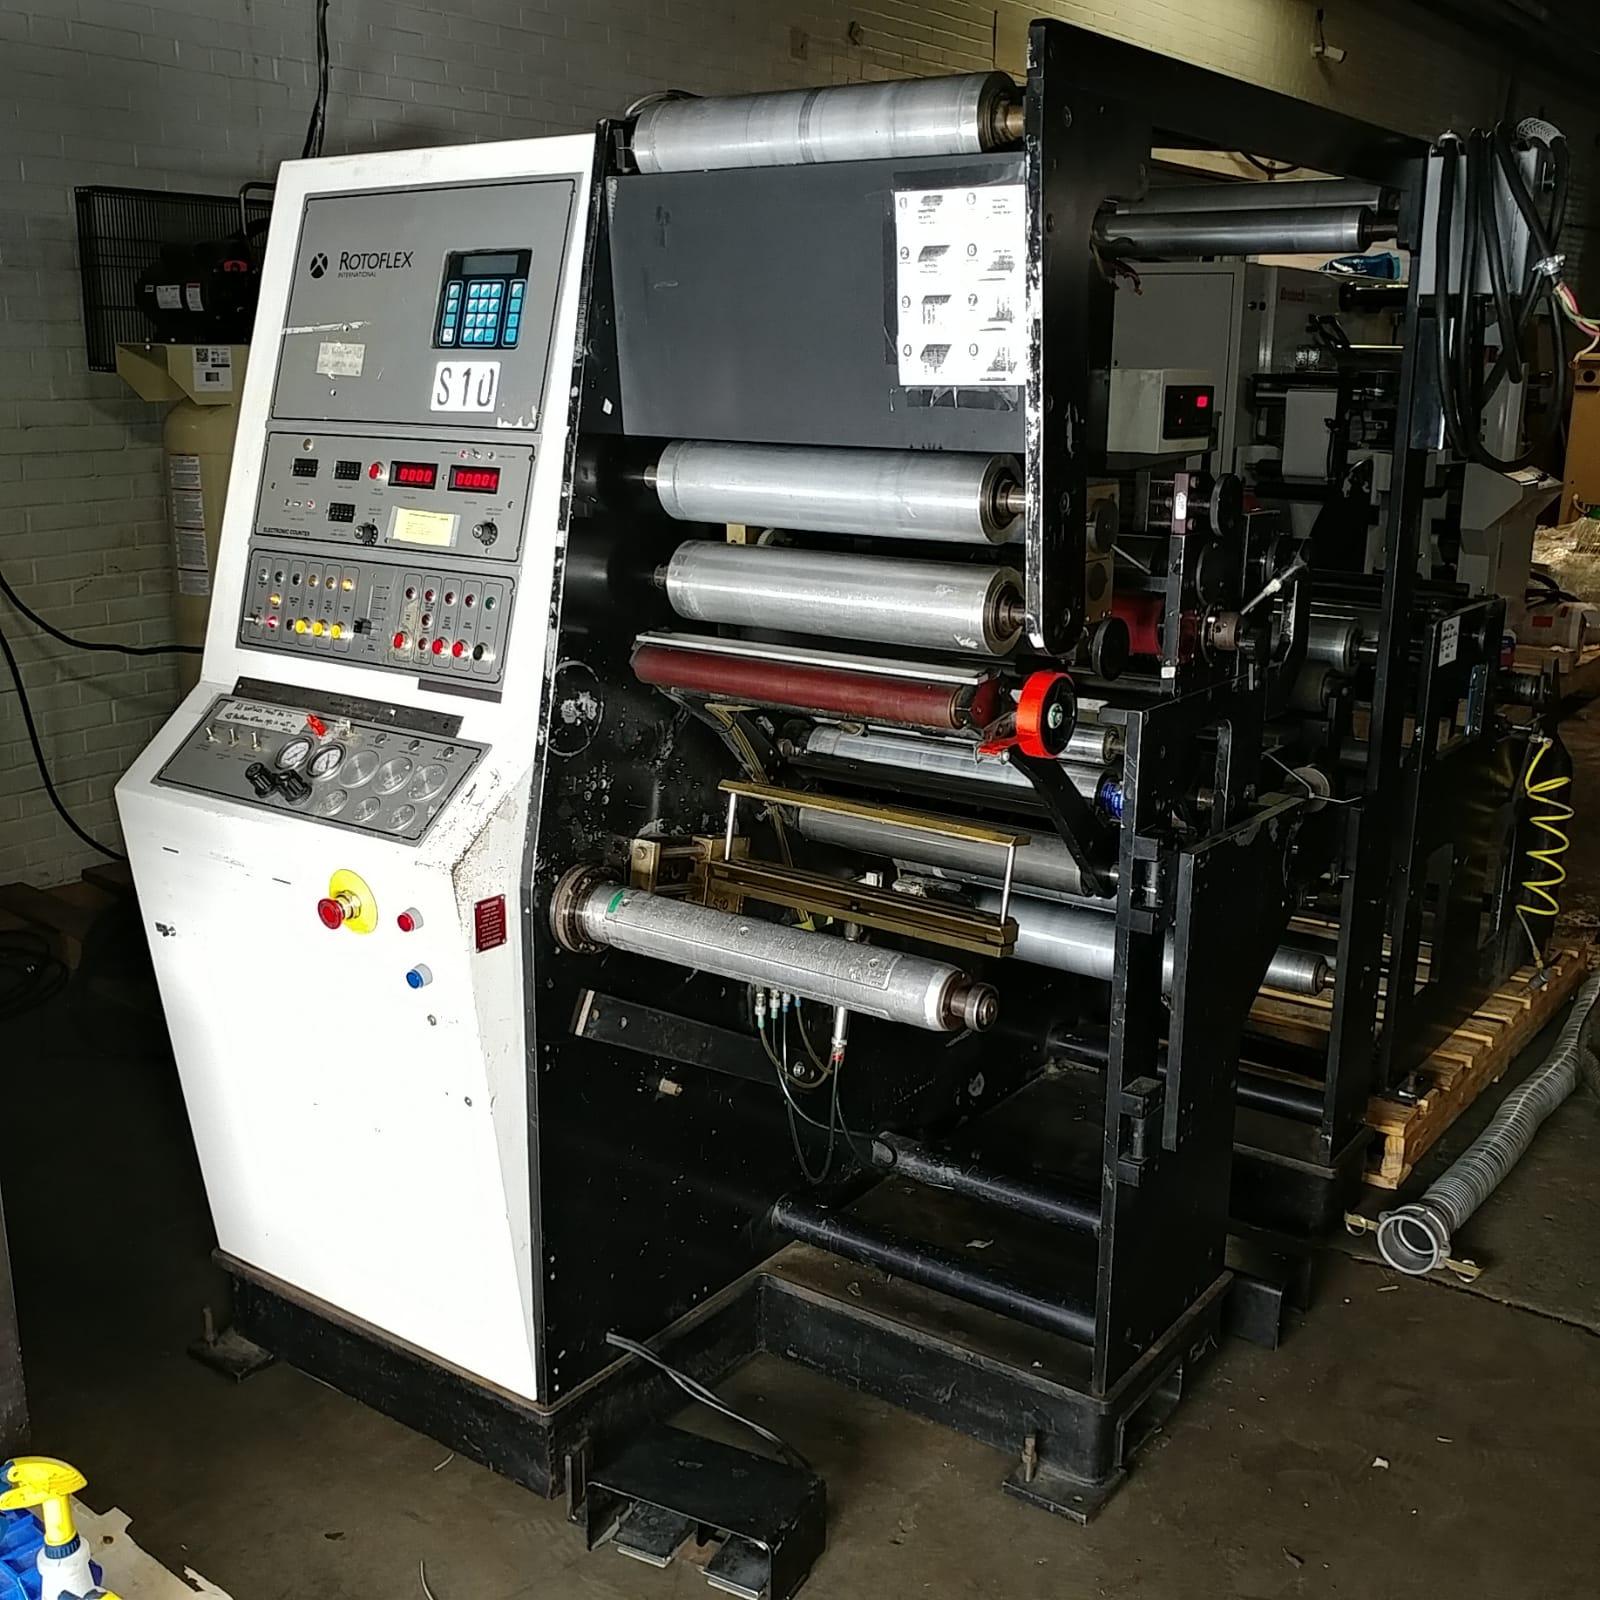 Rotoflex VLI400 - Used Flexo Printing Presses and Used Flexographic Equipment-4